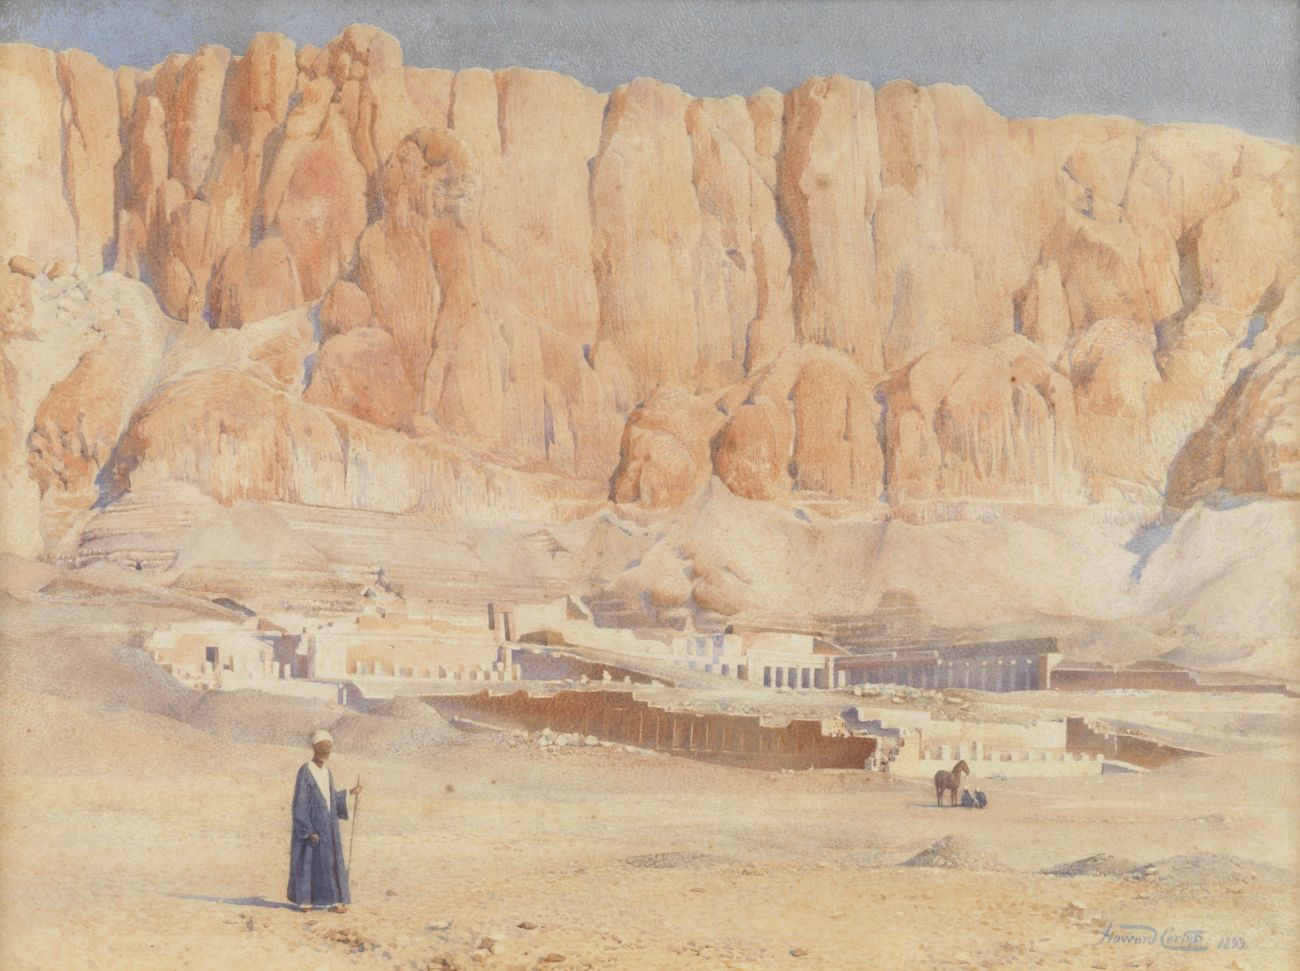 Howard Carter The Temple of Hatshepsut